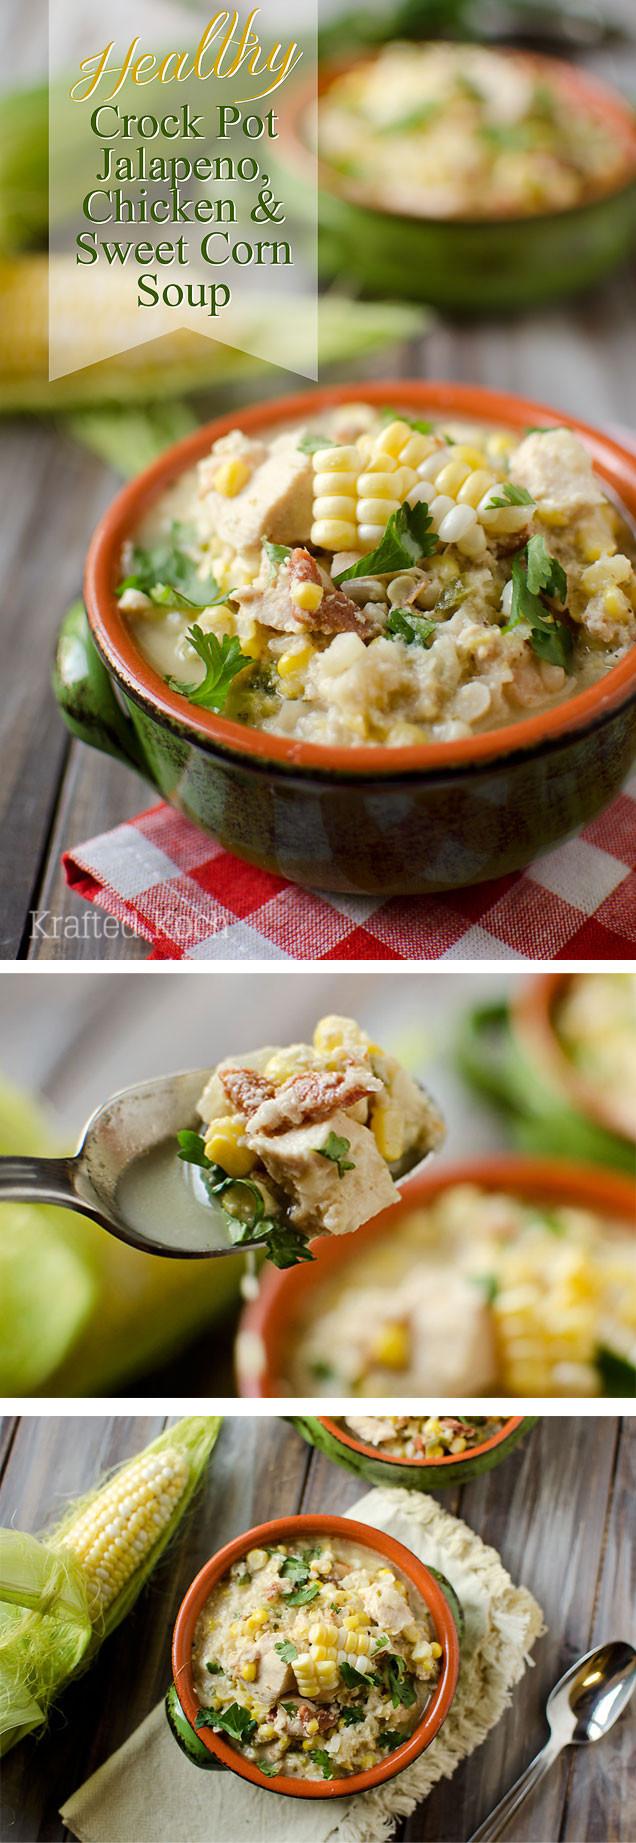 Crockpot Chicken Soup Recipes Healthy  Healthy Crock Pot Jalapeno Chicken & Sweet Corn Soup